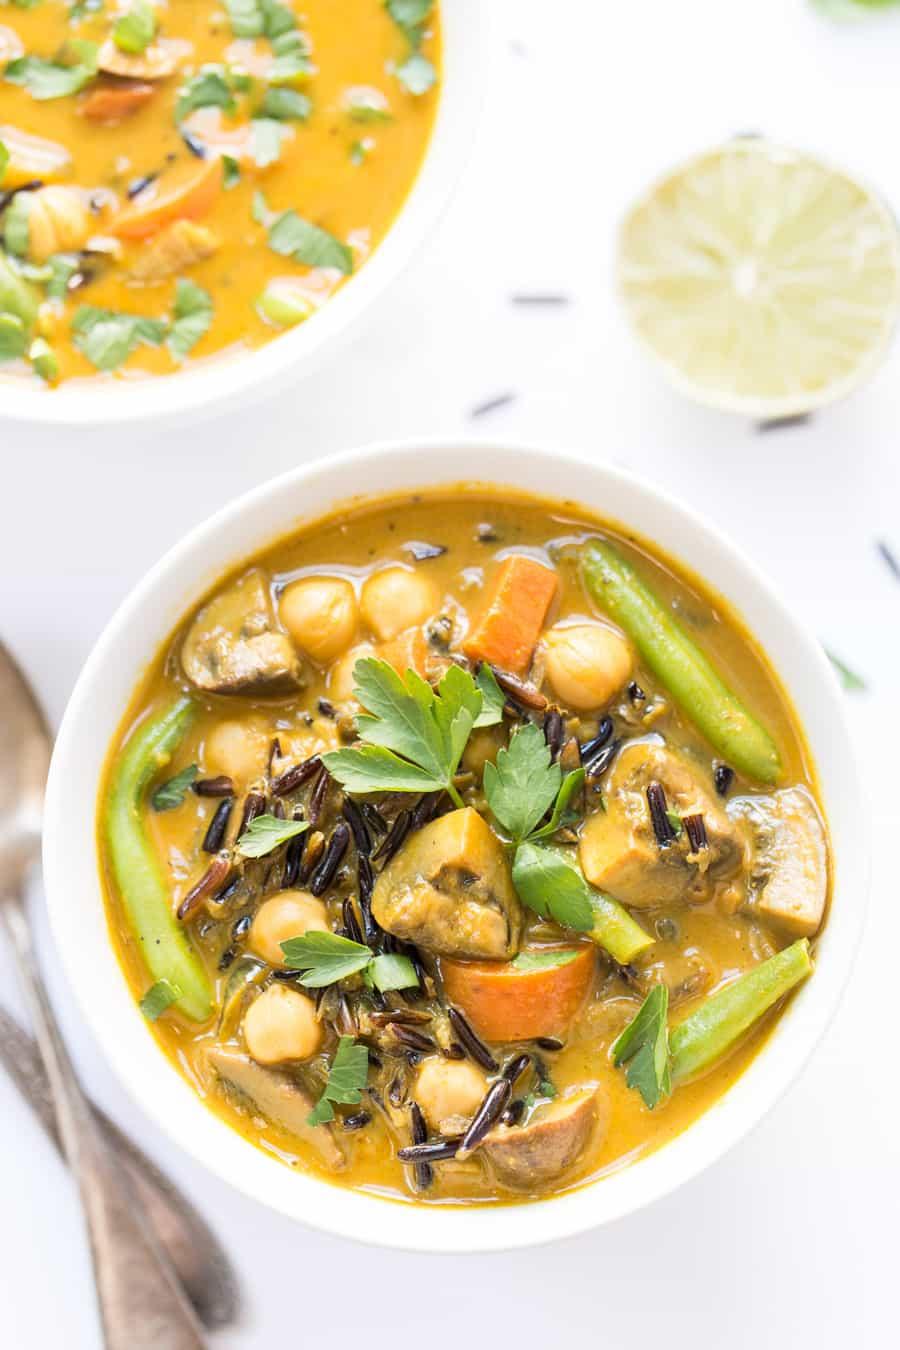 Holiday Detox Recipes | Creamy Coconut Turmeric Wild Rice & Veggie Soup